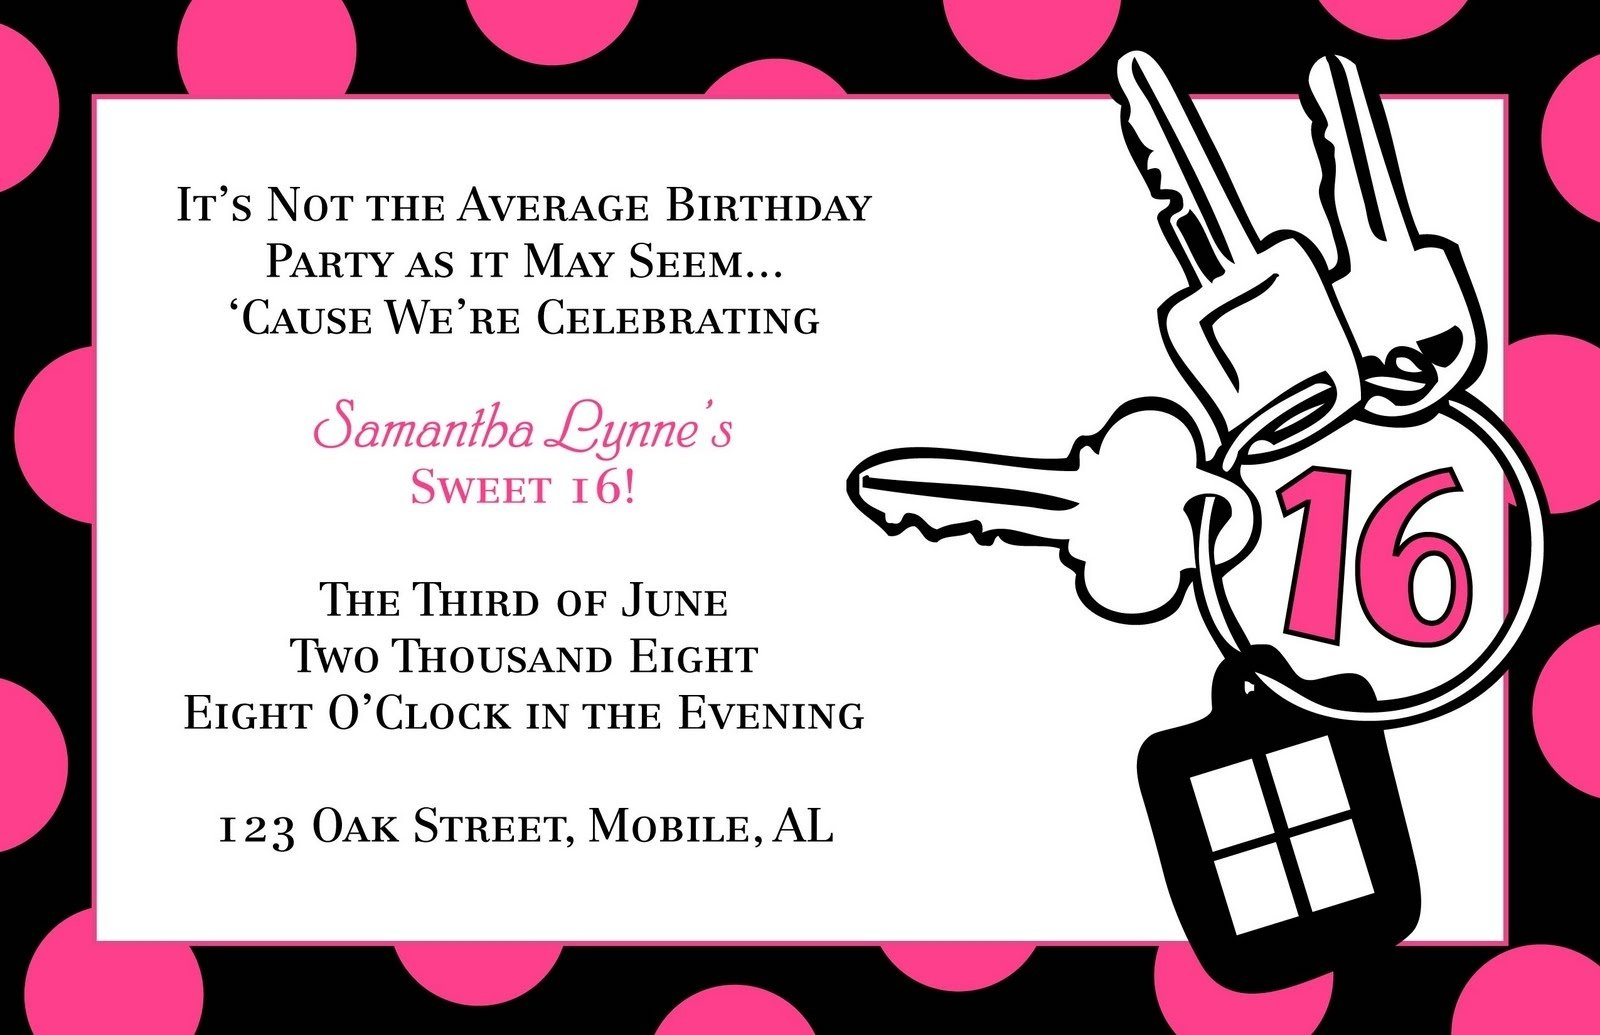 10 Best Awesome Sweet 16 Party Ideas sweet 16 birthday invitation templates dolanpedia invitations 2020